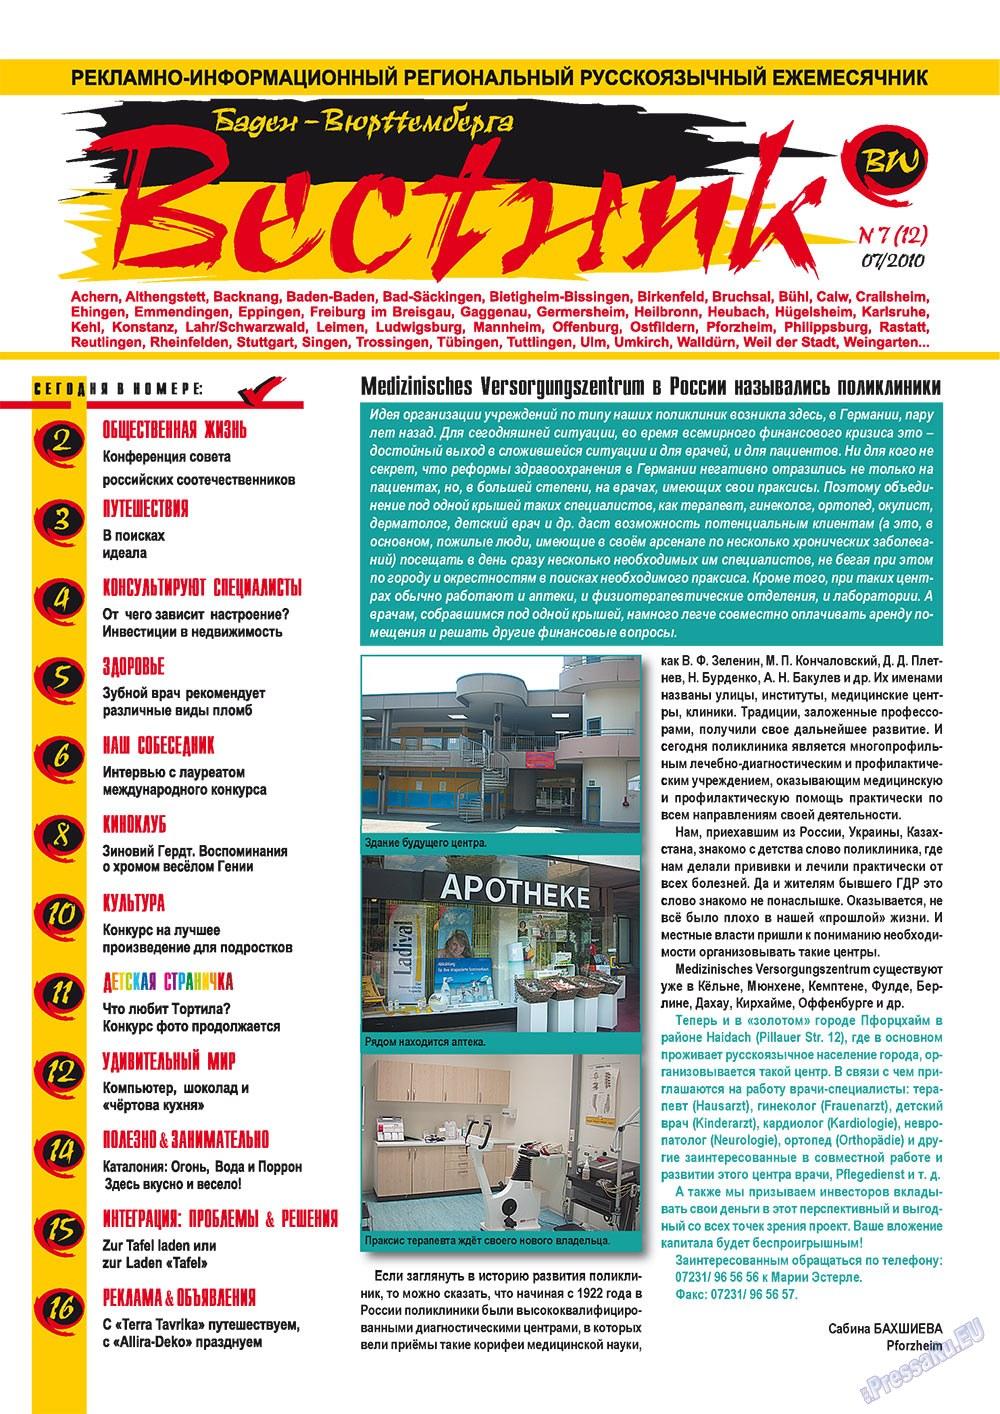 Вестник-info (журнал). 2010 год, номер 7, стр. 1